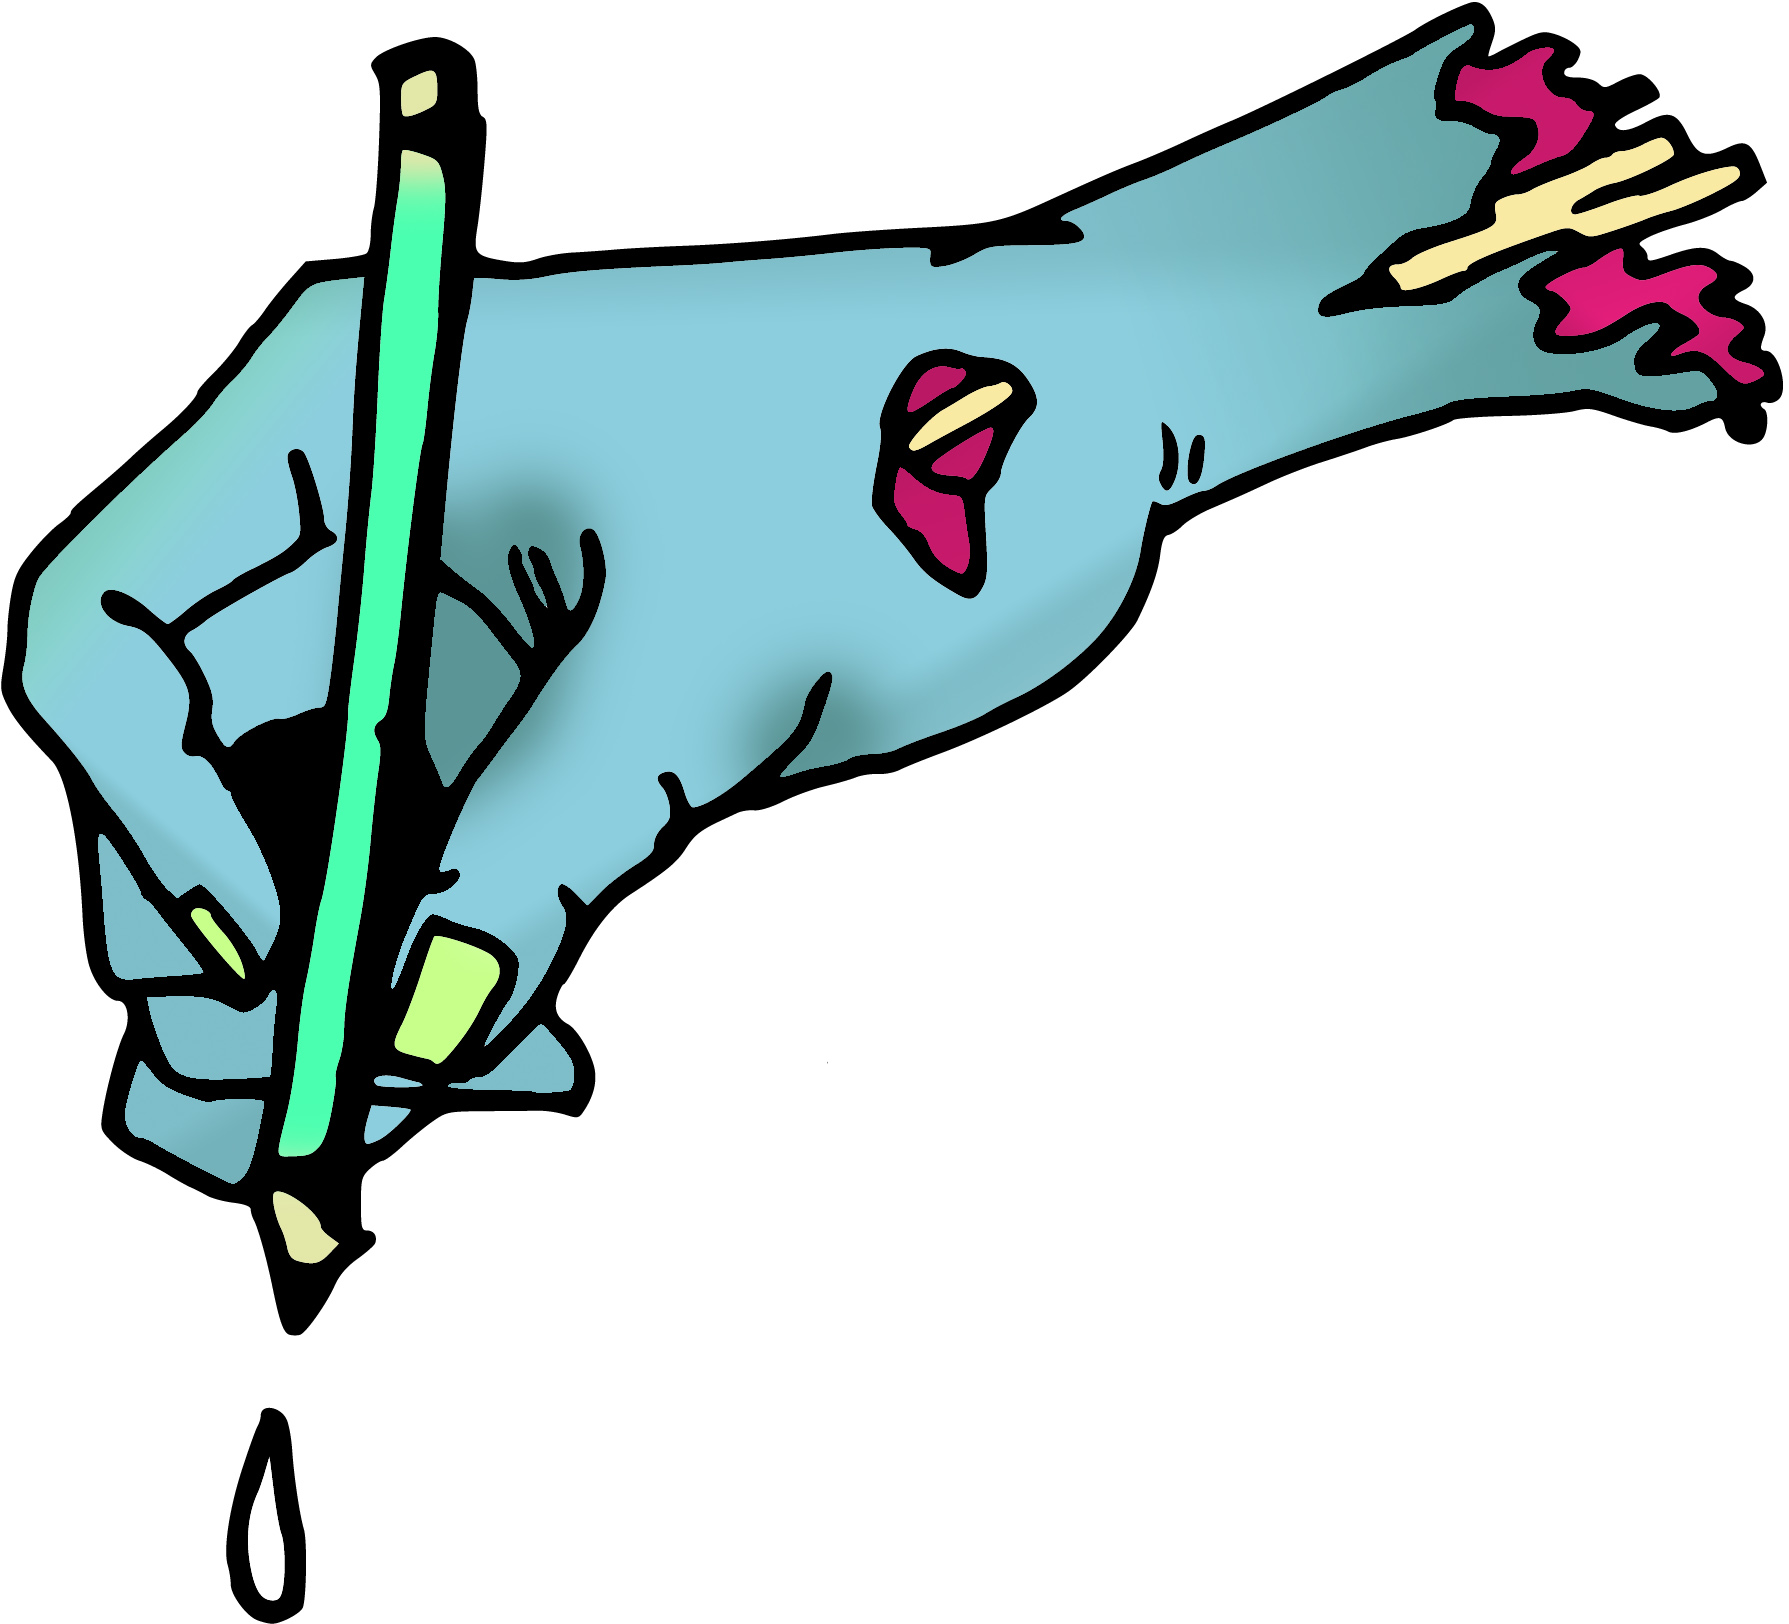 Logo draw or die by punk drawordie on deviantart for Draw logo free